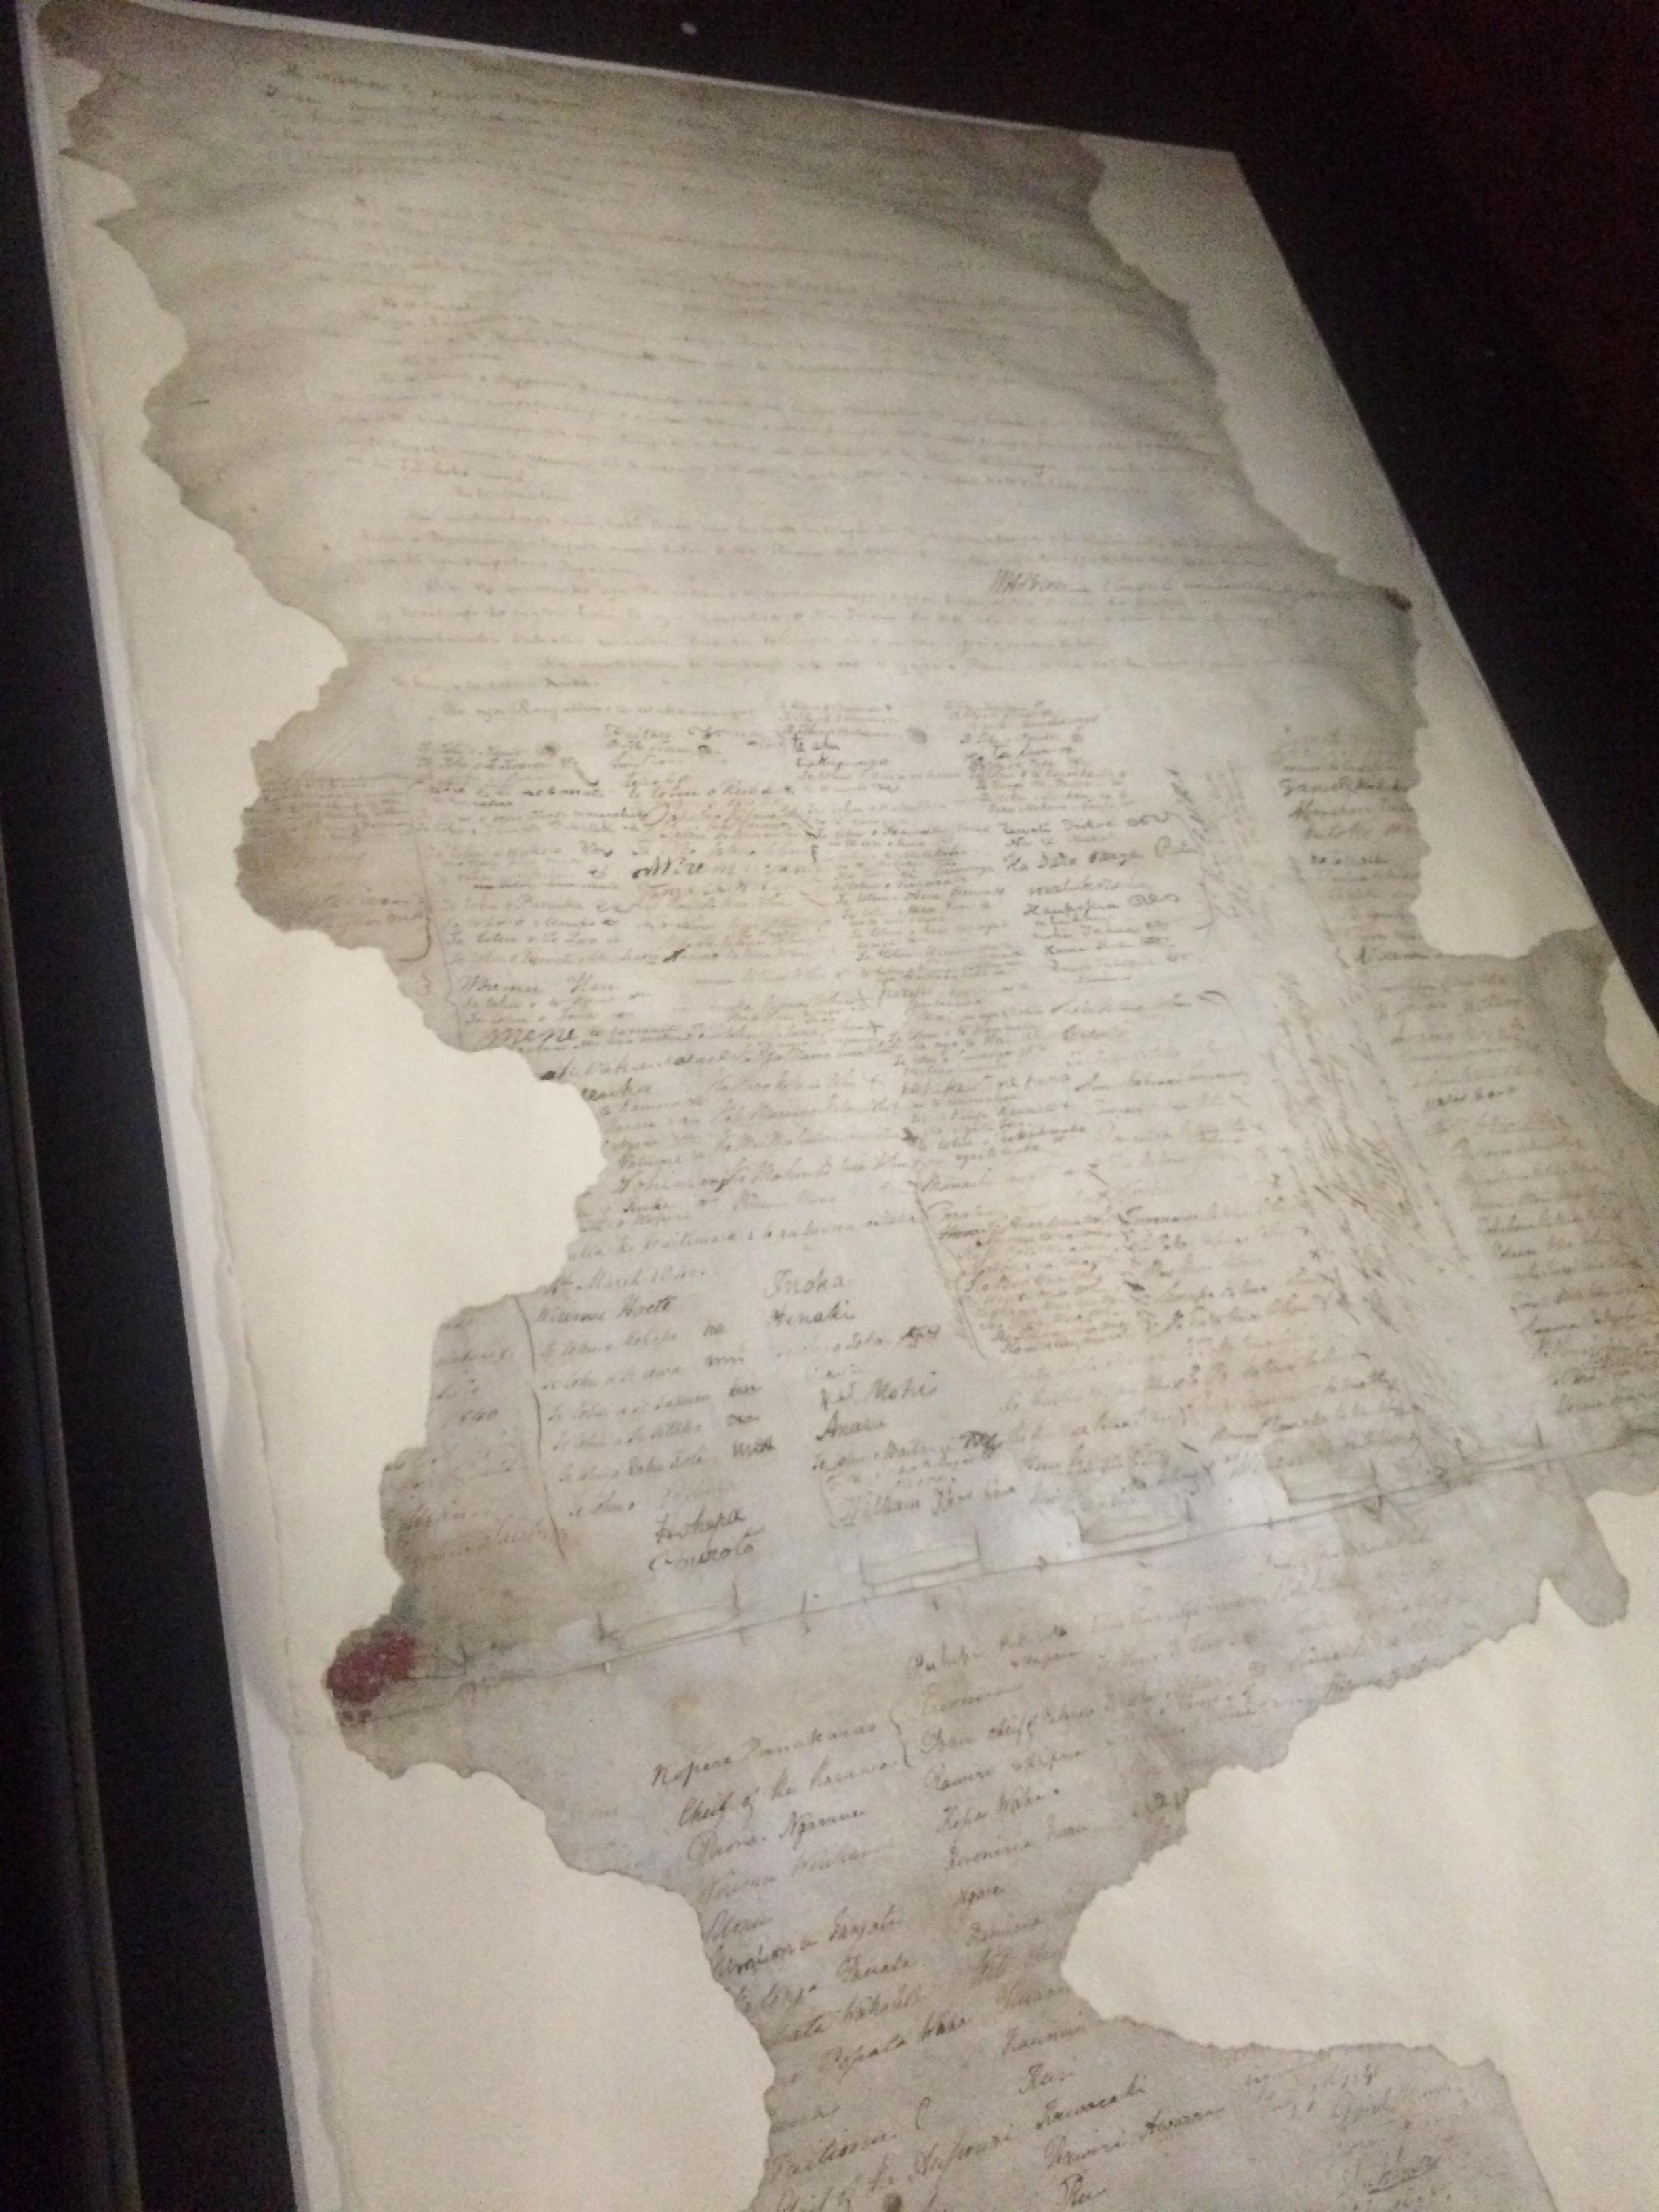 The original written treaty